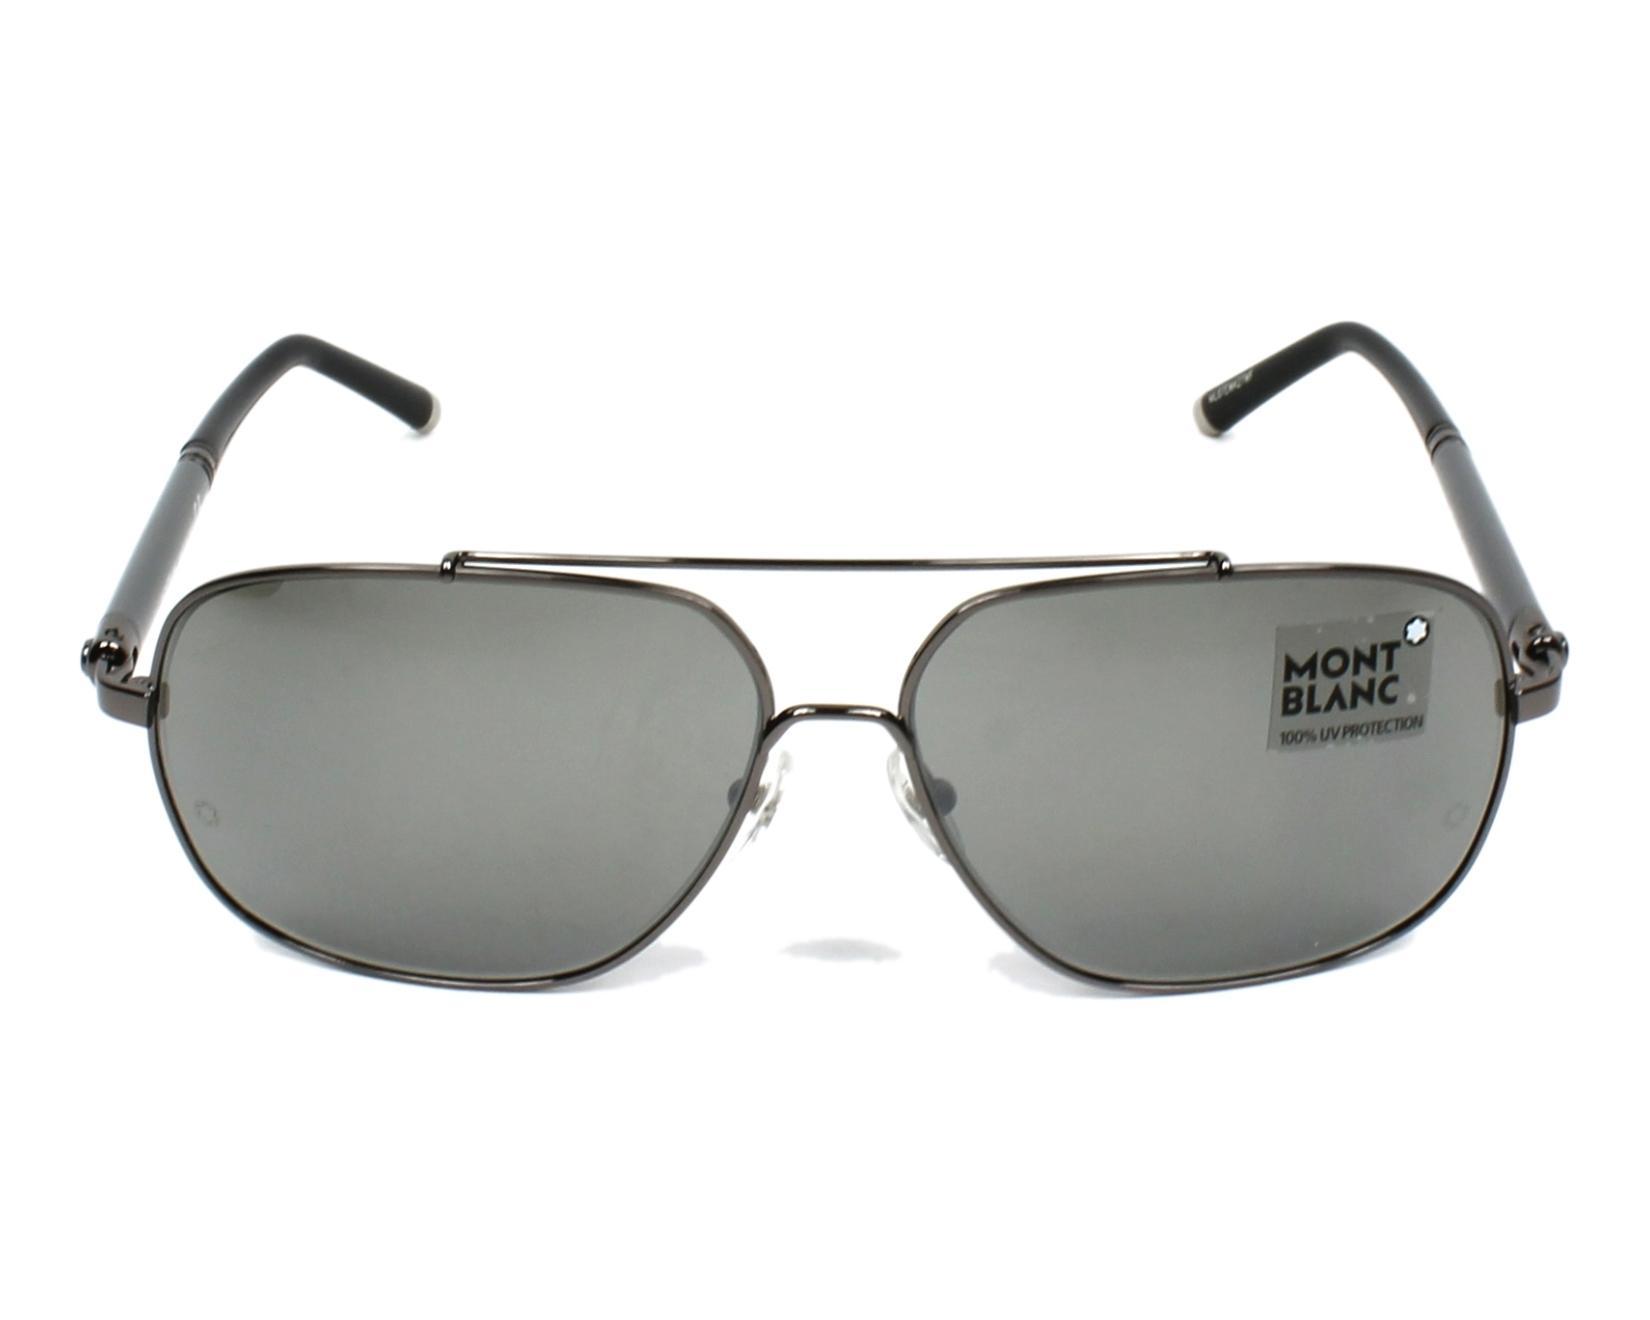 e1fc68d559 Gafas de sol Mont Blanc MB-514-S 08A - Gun Gris vista de